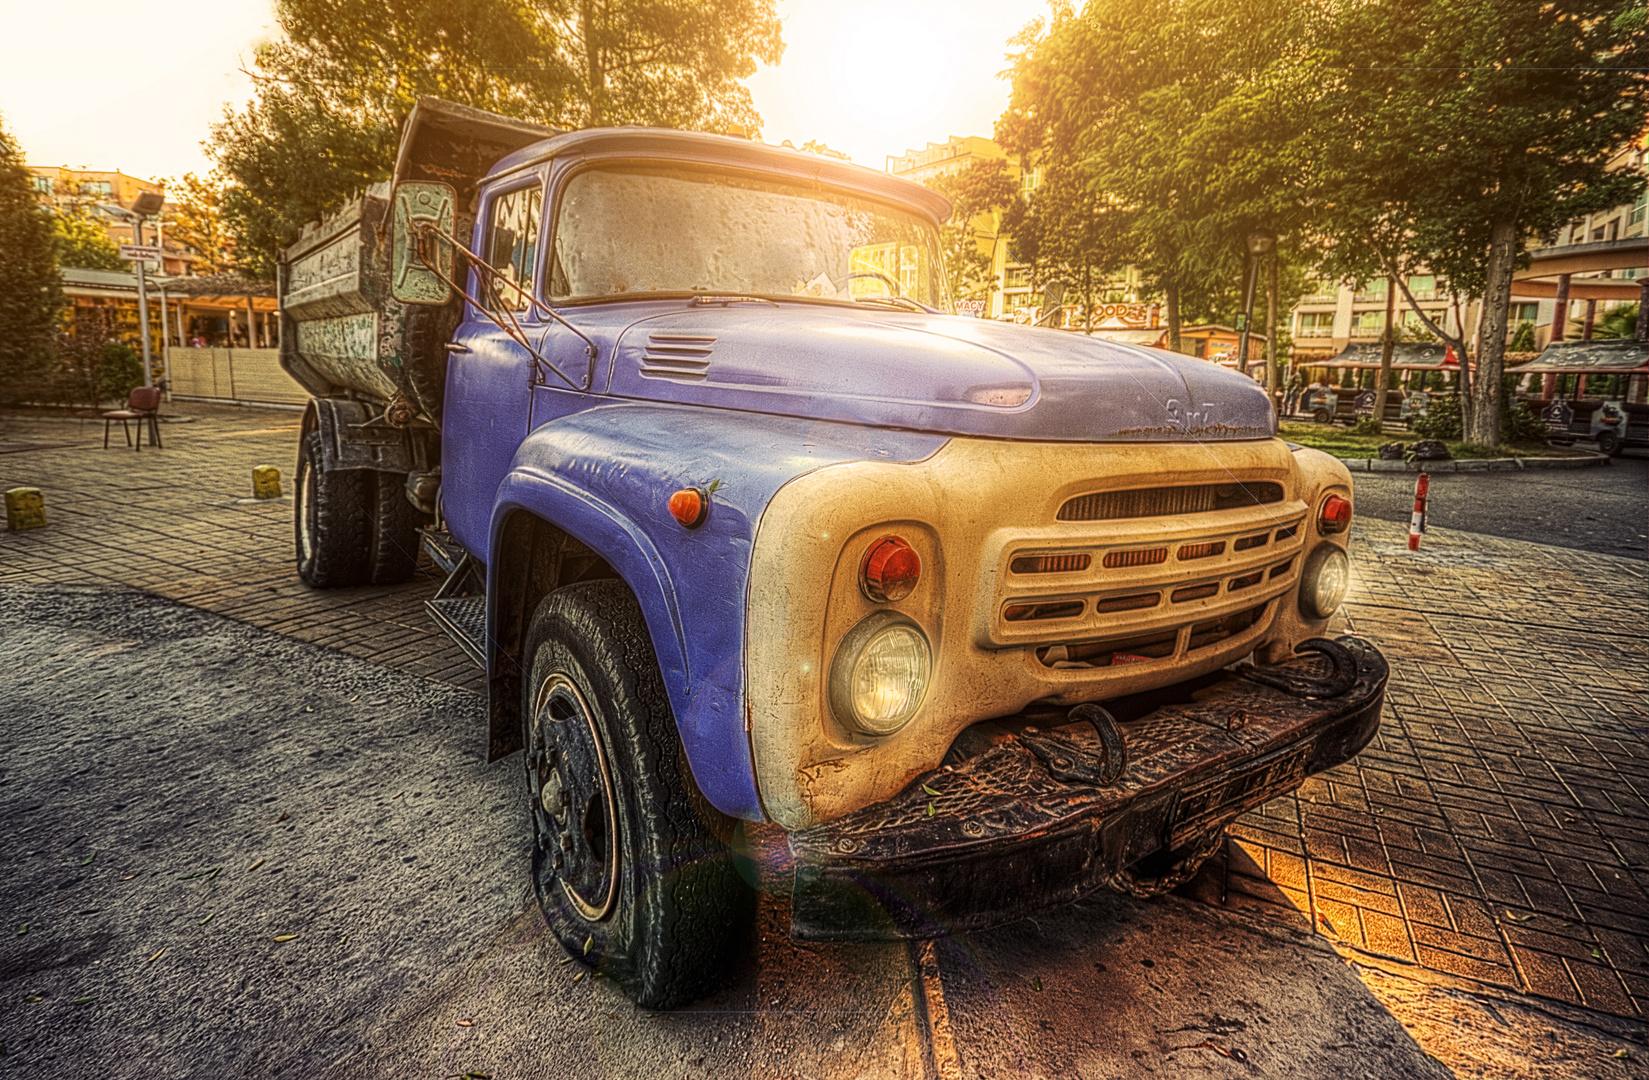 Truck - Sunny Beach Bulgaria